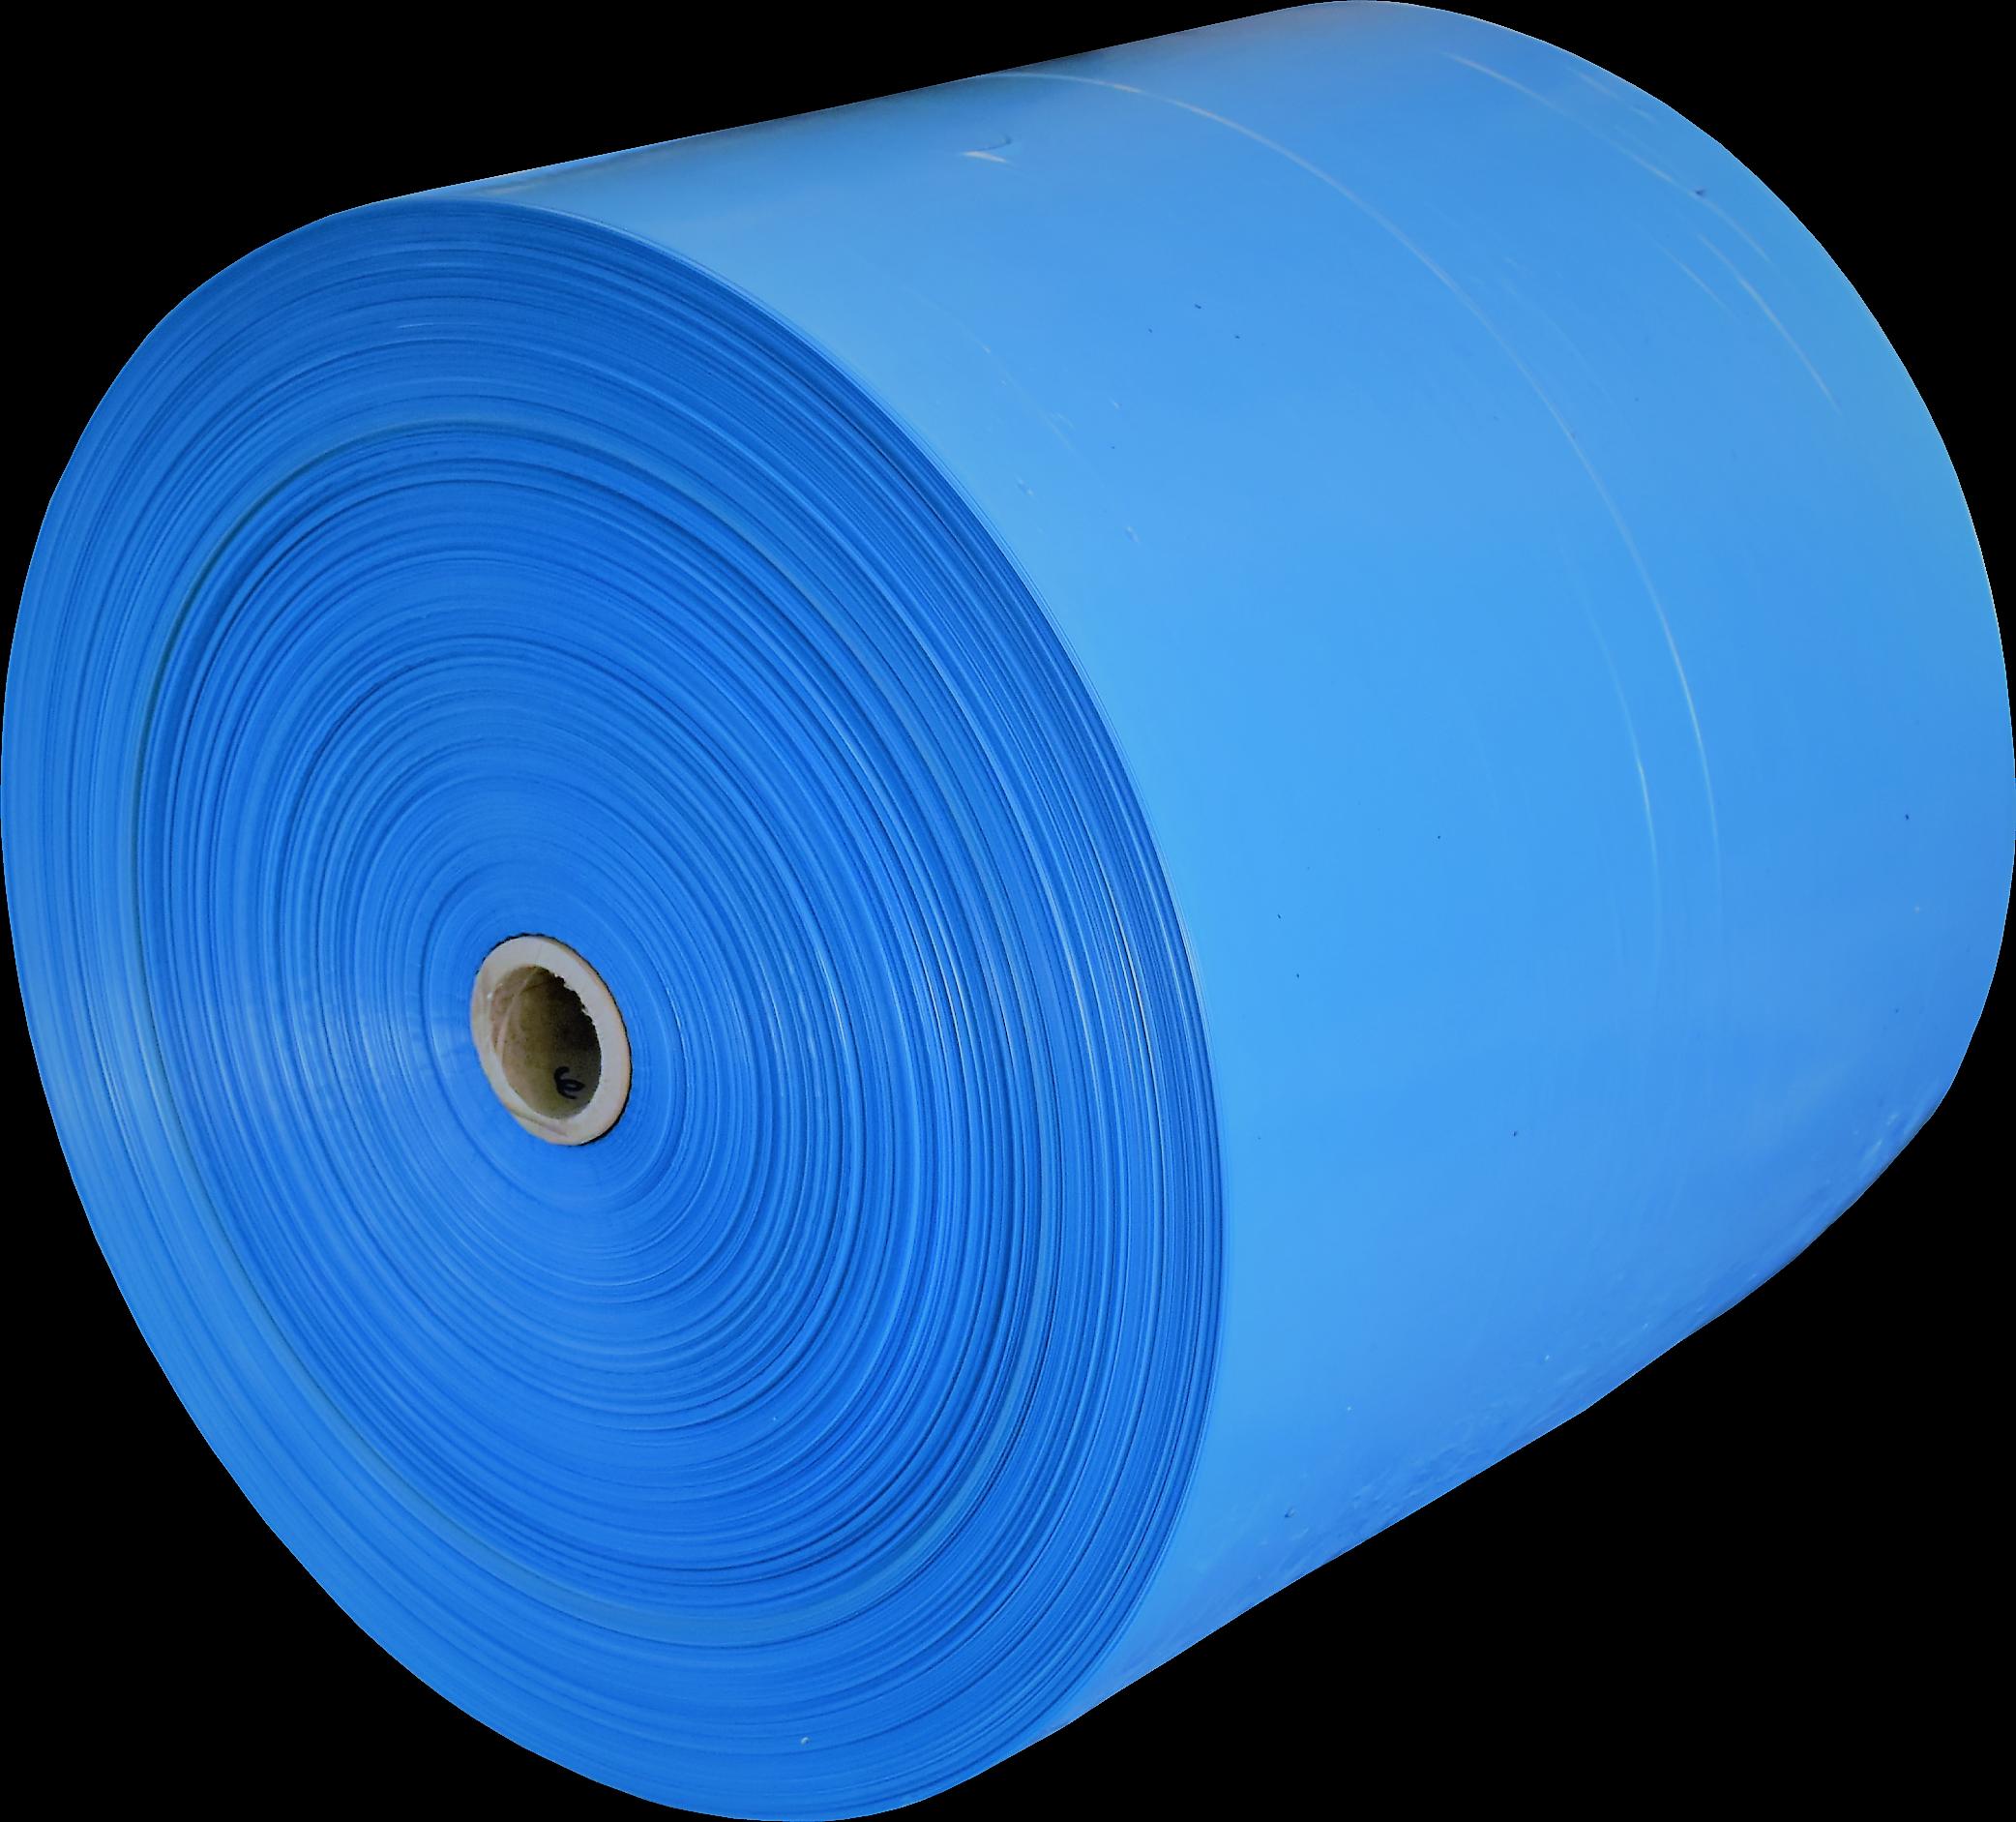 Ancho: 85cm - Color: Azul